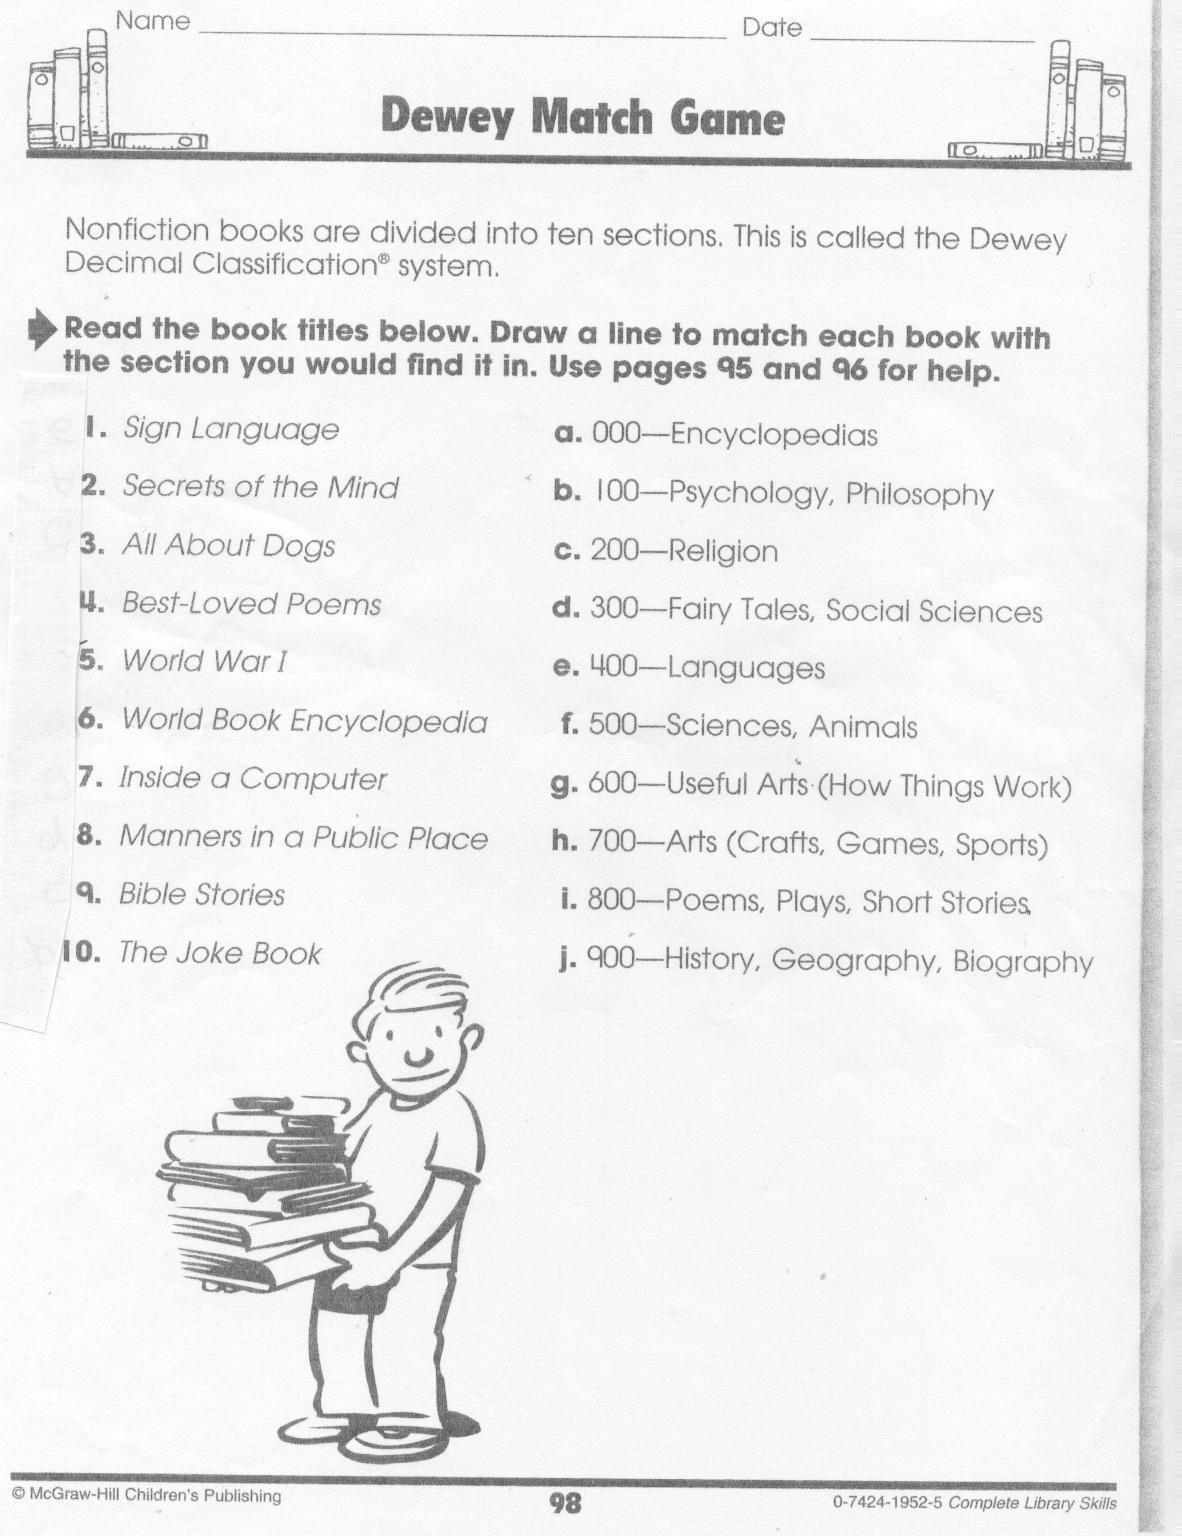 Dewey decimal worksheets dewey decimal worksheets fioradesignstudio dewey decimal system worksheets rringband dewey decimal worksheets robcynllc Images